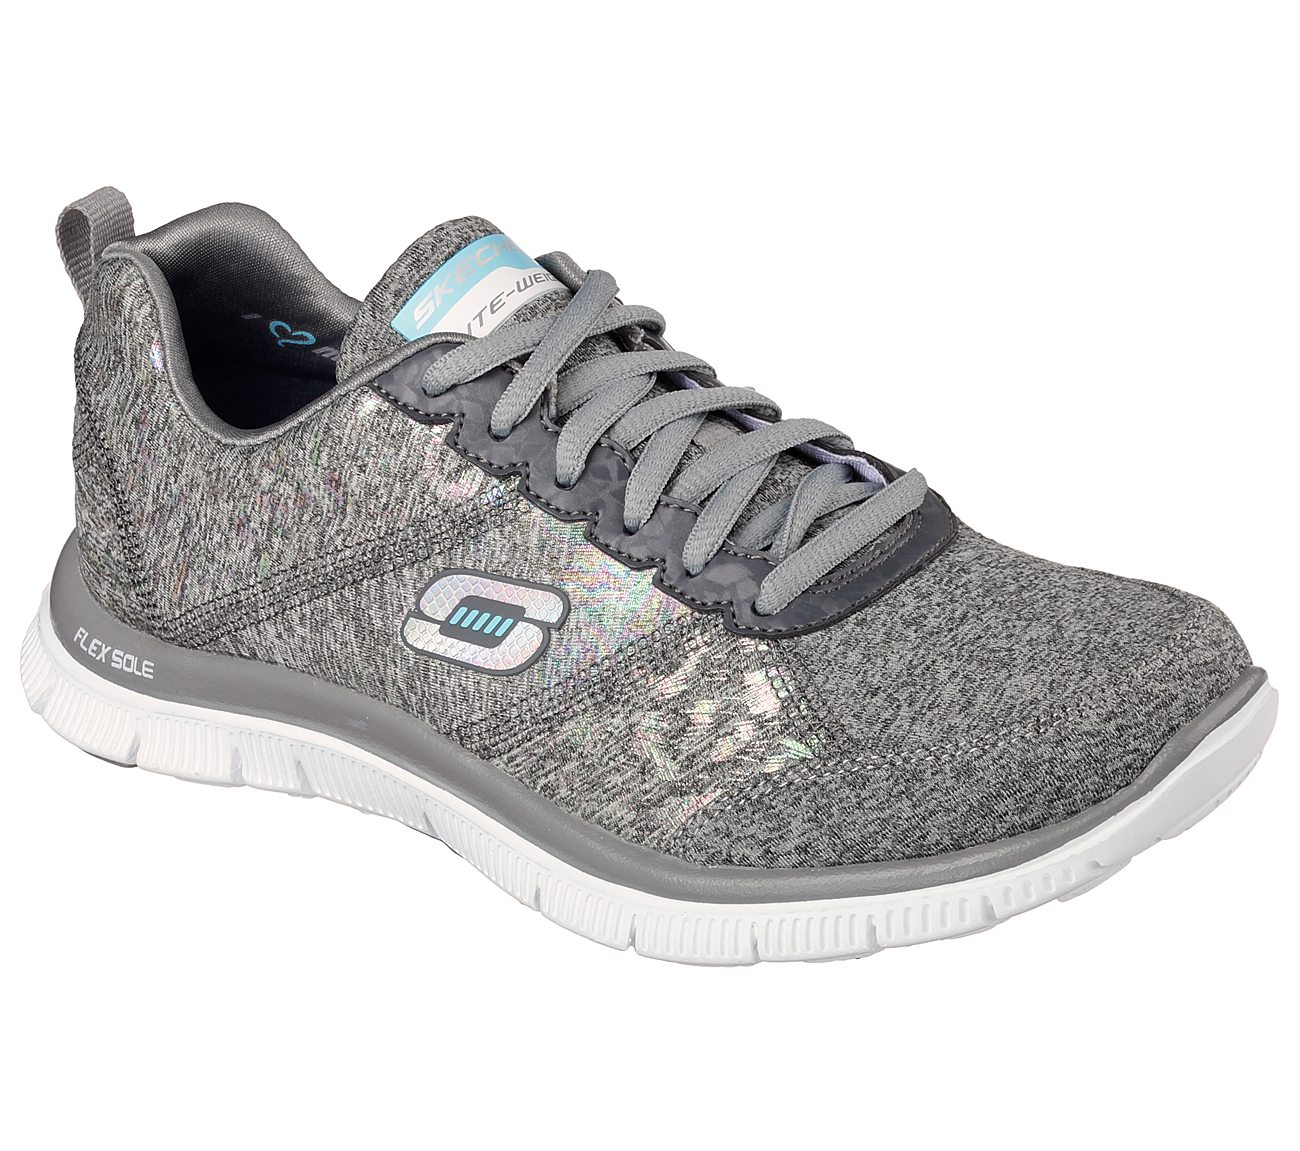 Skechers Flex Appeal Hollywood Hills 12199 Sport Shoes Color Grey  Women